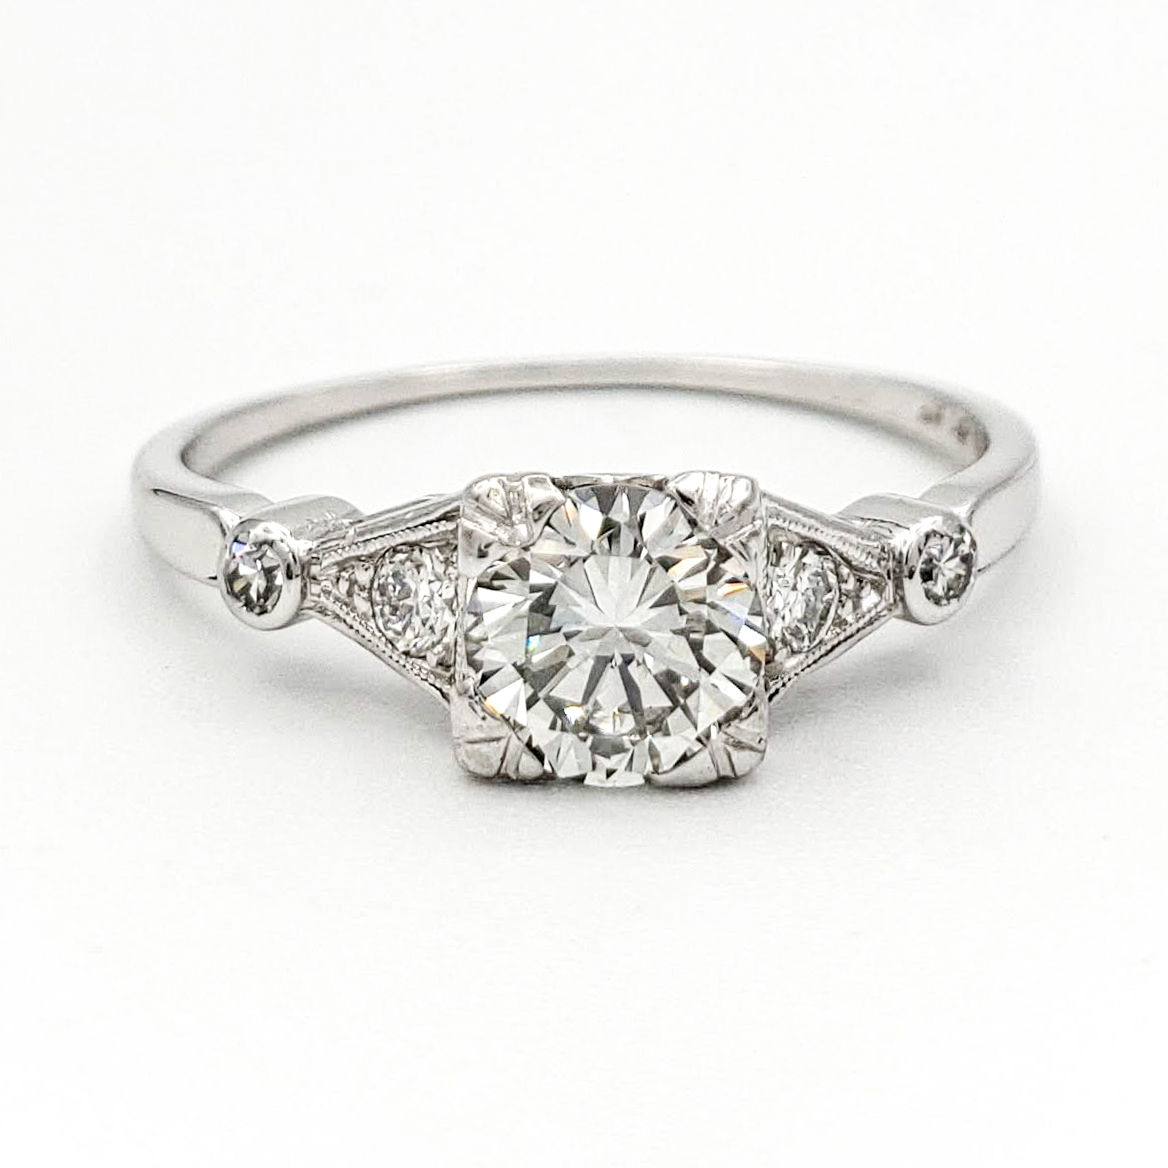 vintage-platinum-engagement-ring-with-0-57-carat-round-brilliant-cut-diamond-egl-g-vs2